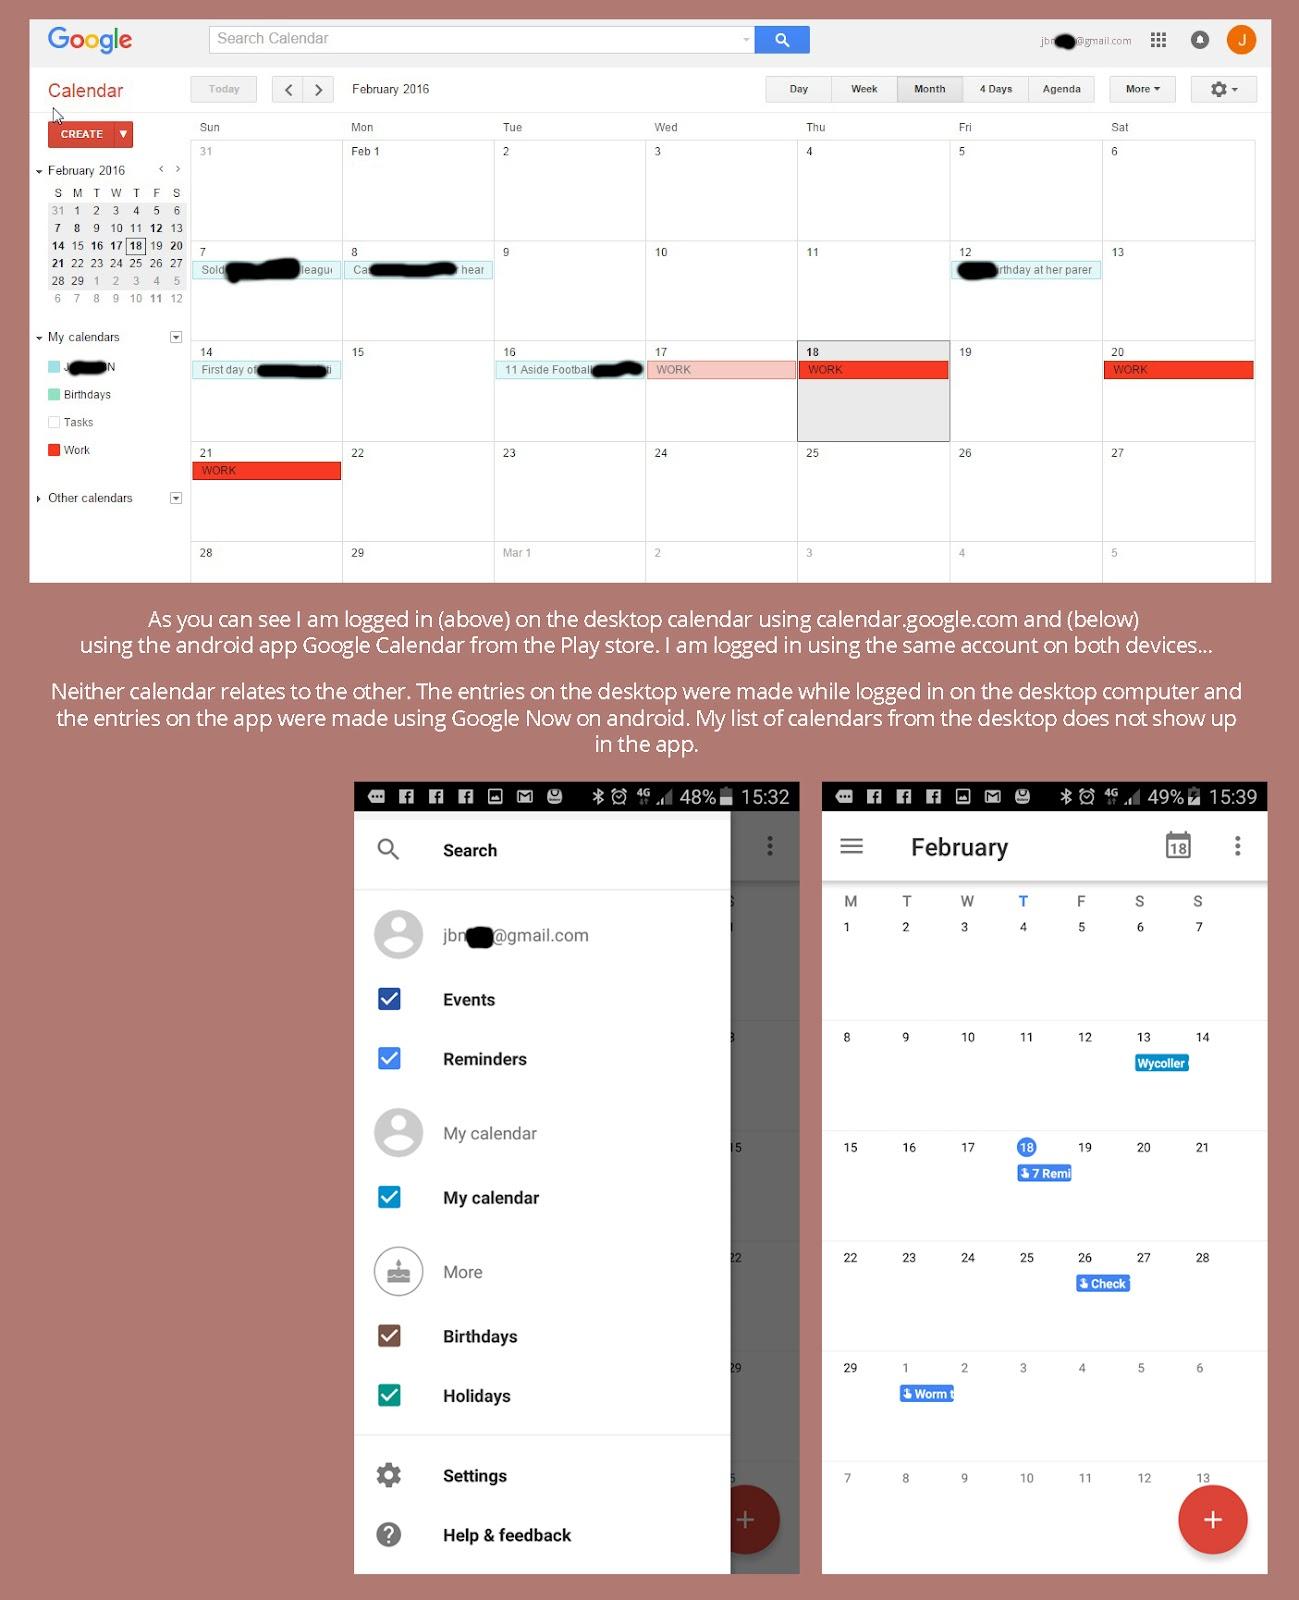 CALENDAR GOOGLE DESKTOP - How to use Google Calendar on